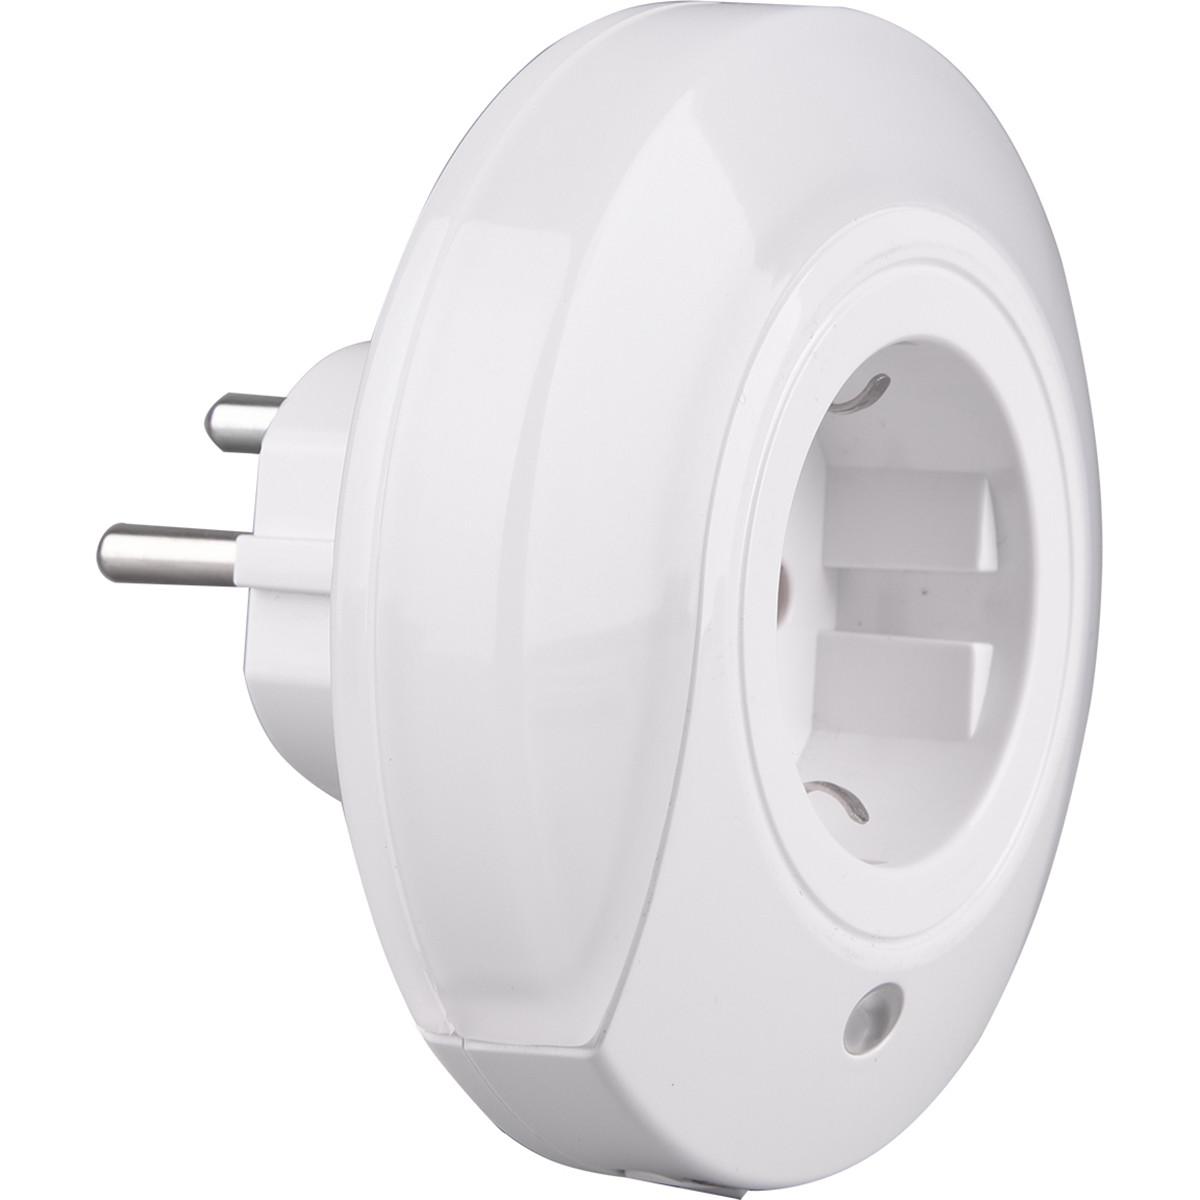 Stekkerlamp Lamp Stekkerspot met Stopcontact Trion Mirloni 6W Warm Wit 3000K Rond Mat Wit Kunststof